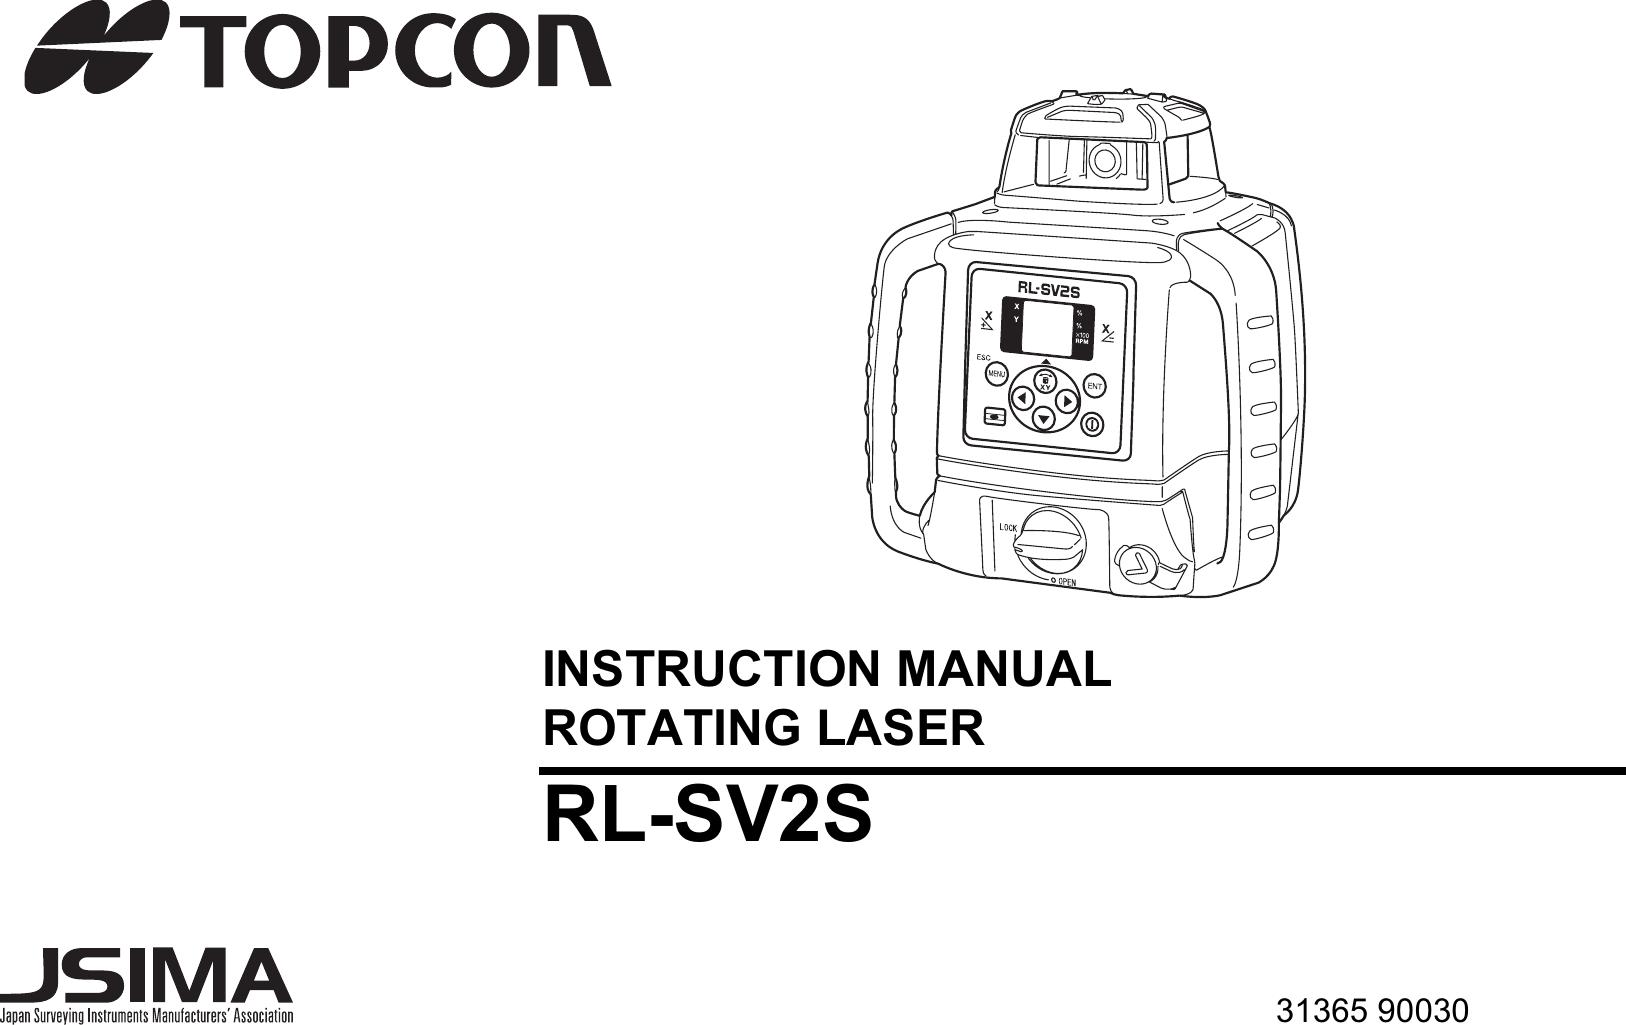 Topcon RLSV Rotating Laser User Manual RL SV2S E 0628